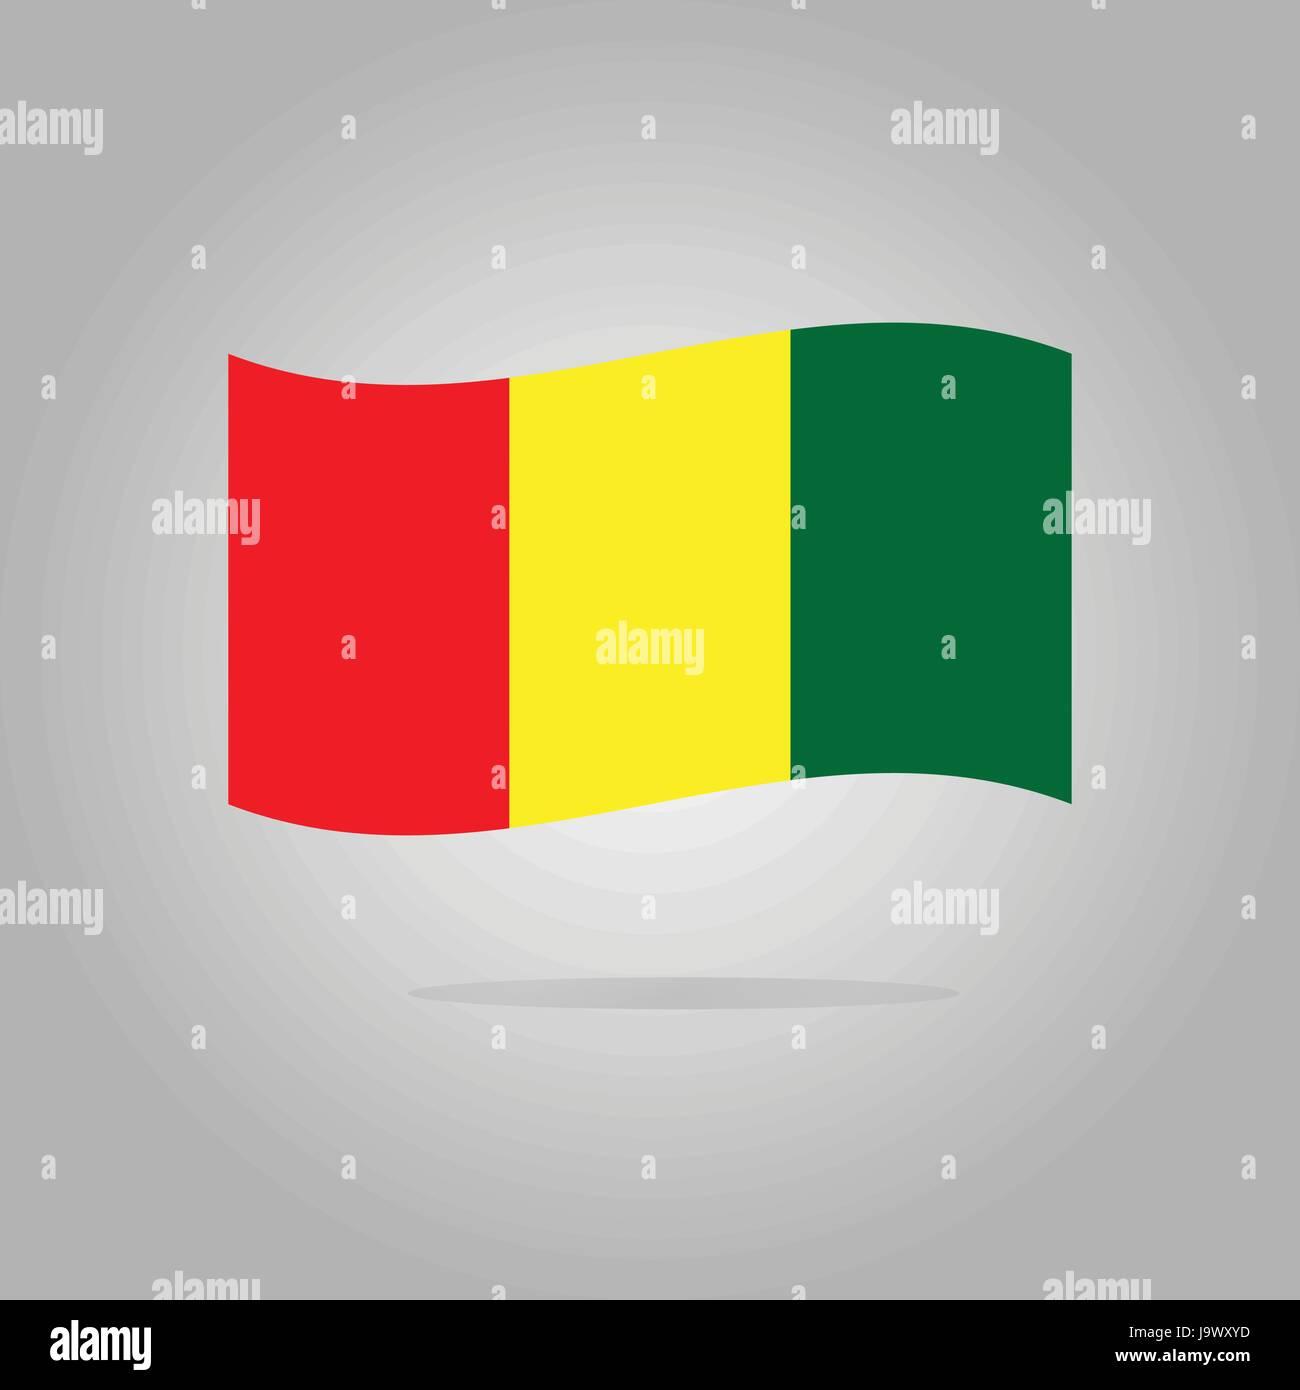 flag design illustration - Stock Image